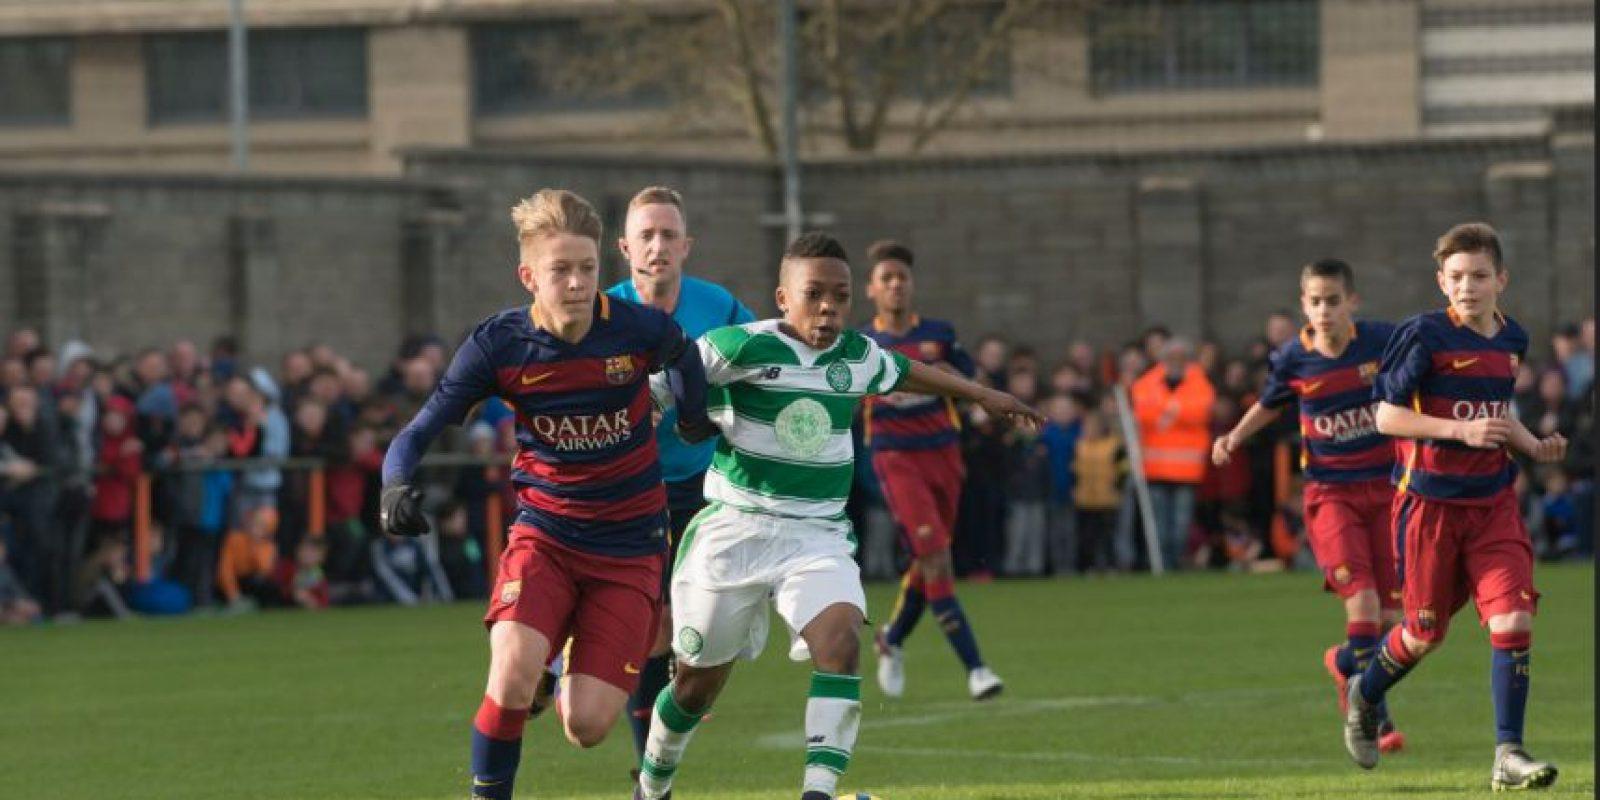 Nacido el 2003 en Costa de Marfil, llegó en 2013 al Celtic escocés . Foto:Paul Dolan-Flickr